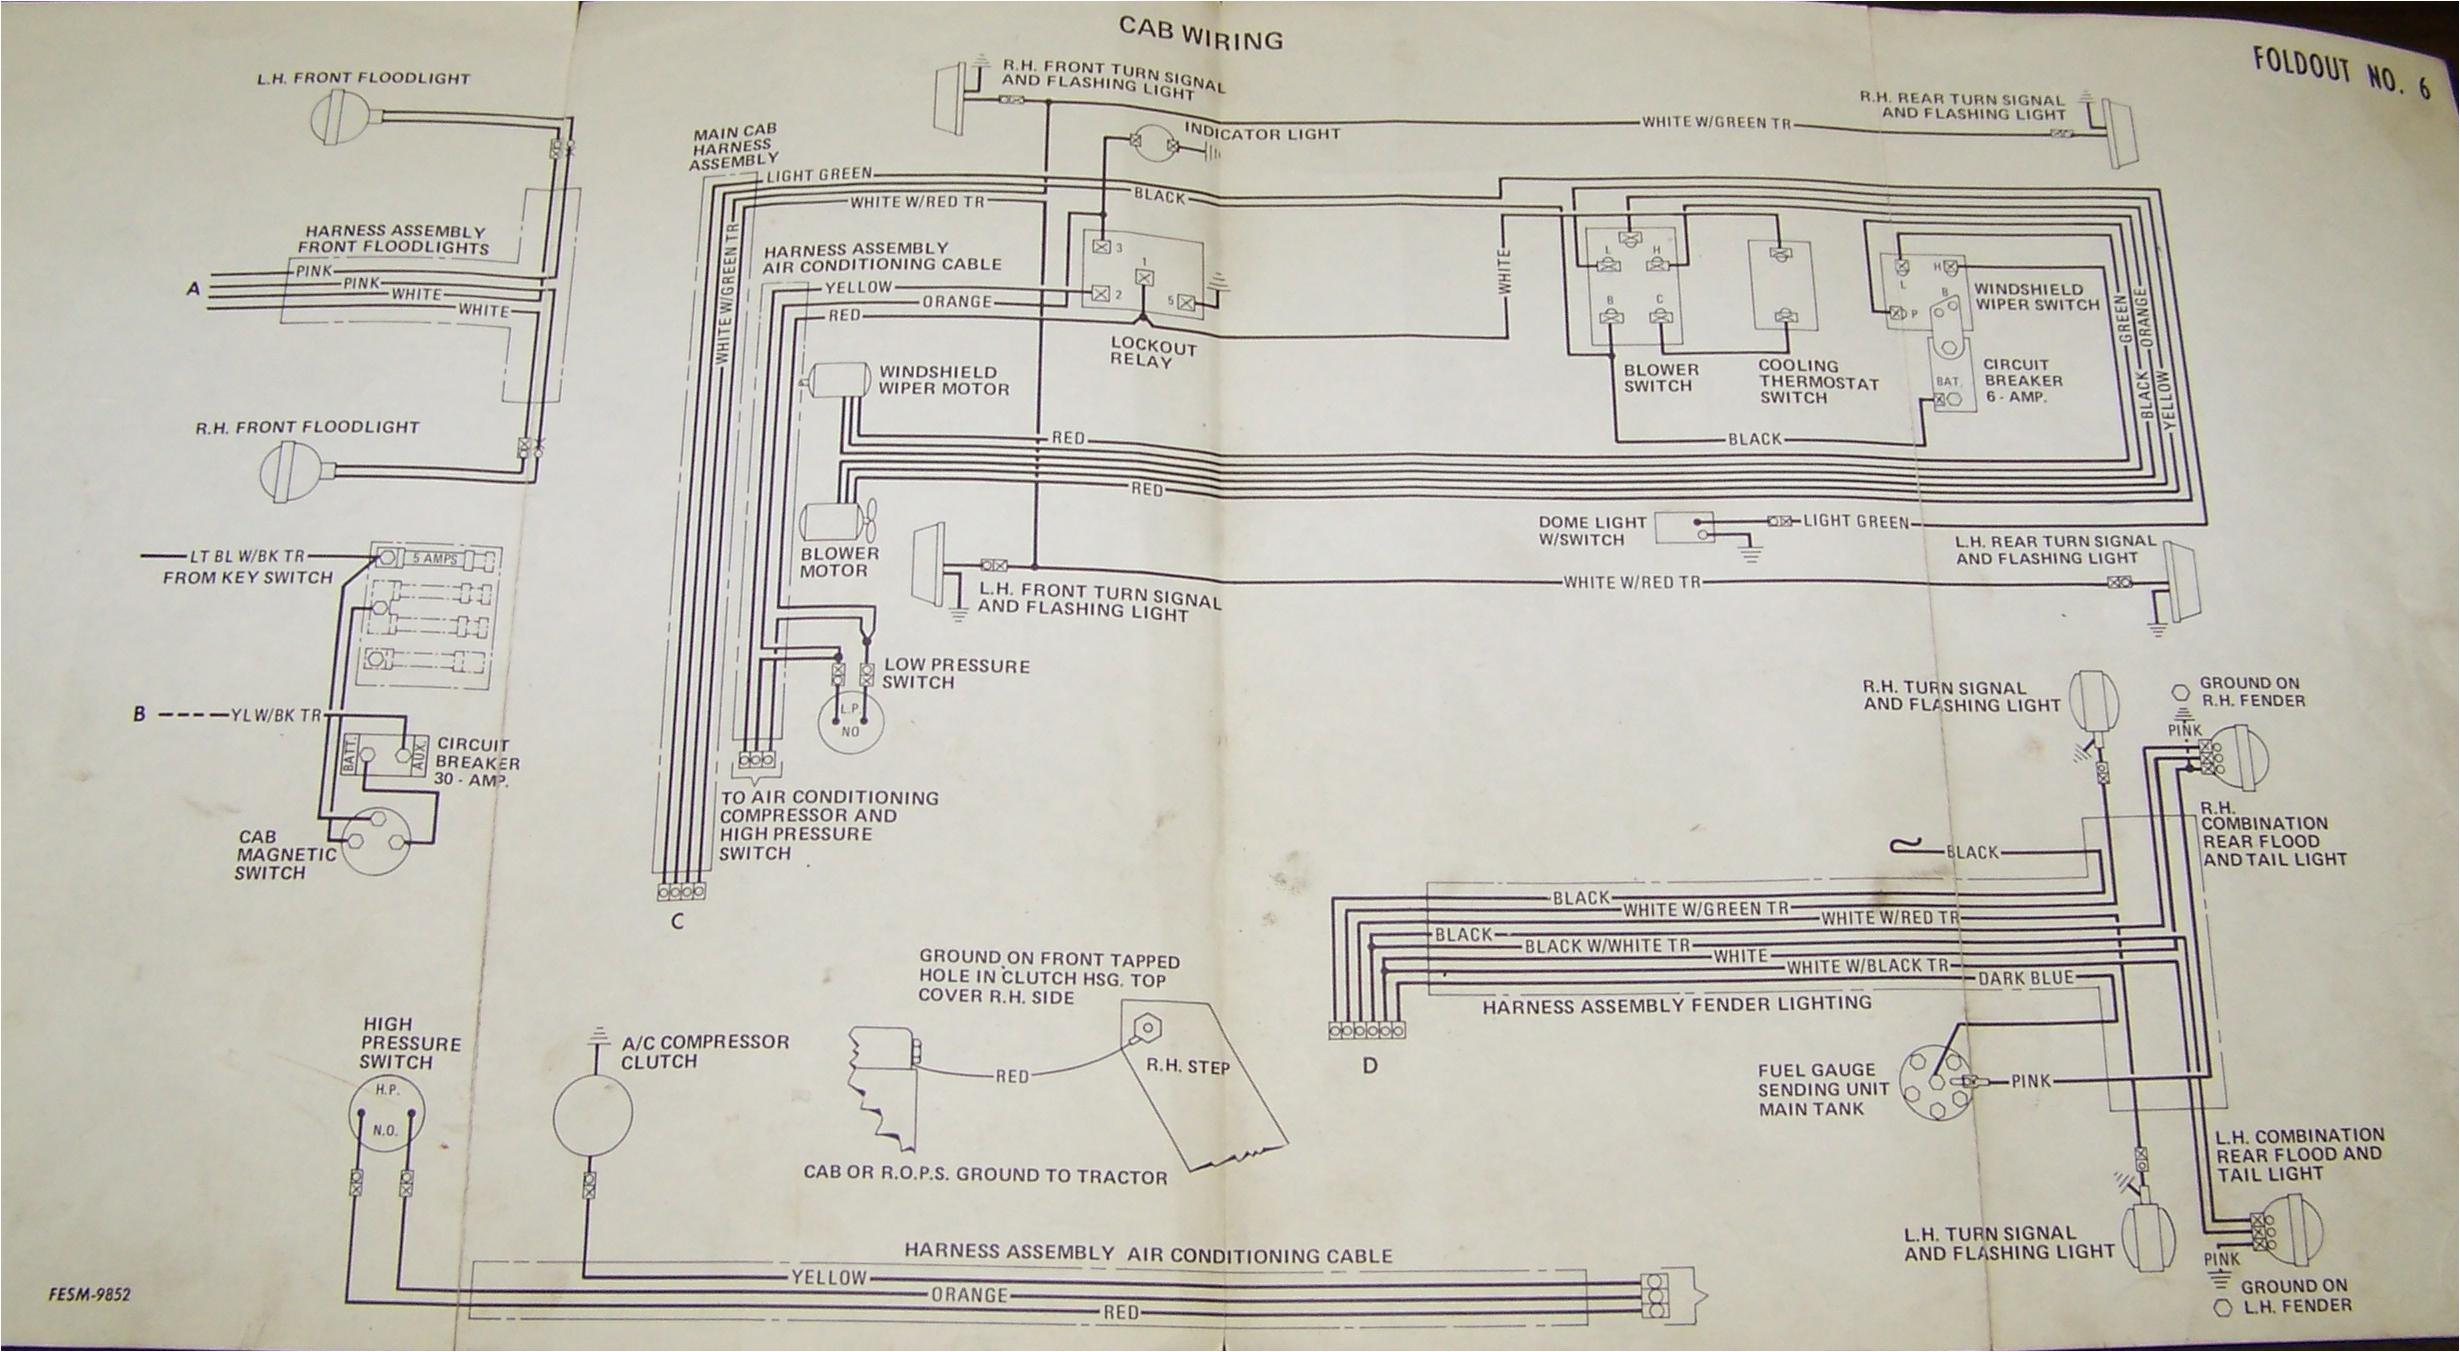 2394 case wiring diagram wiring diagram case ih 2394 tractor wiring diagram wiring diagram amecase international